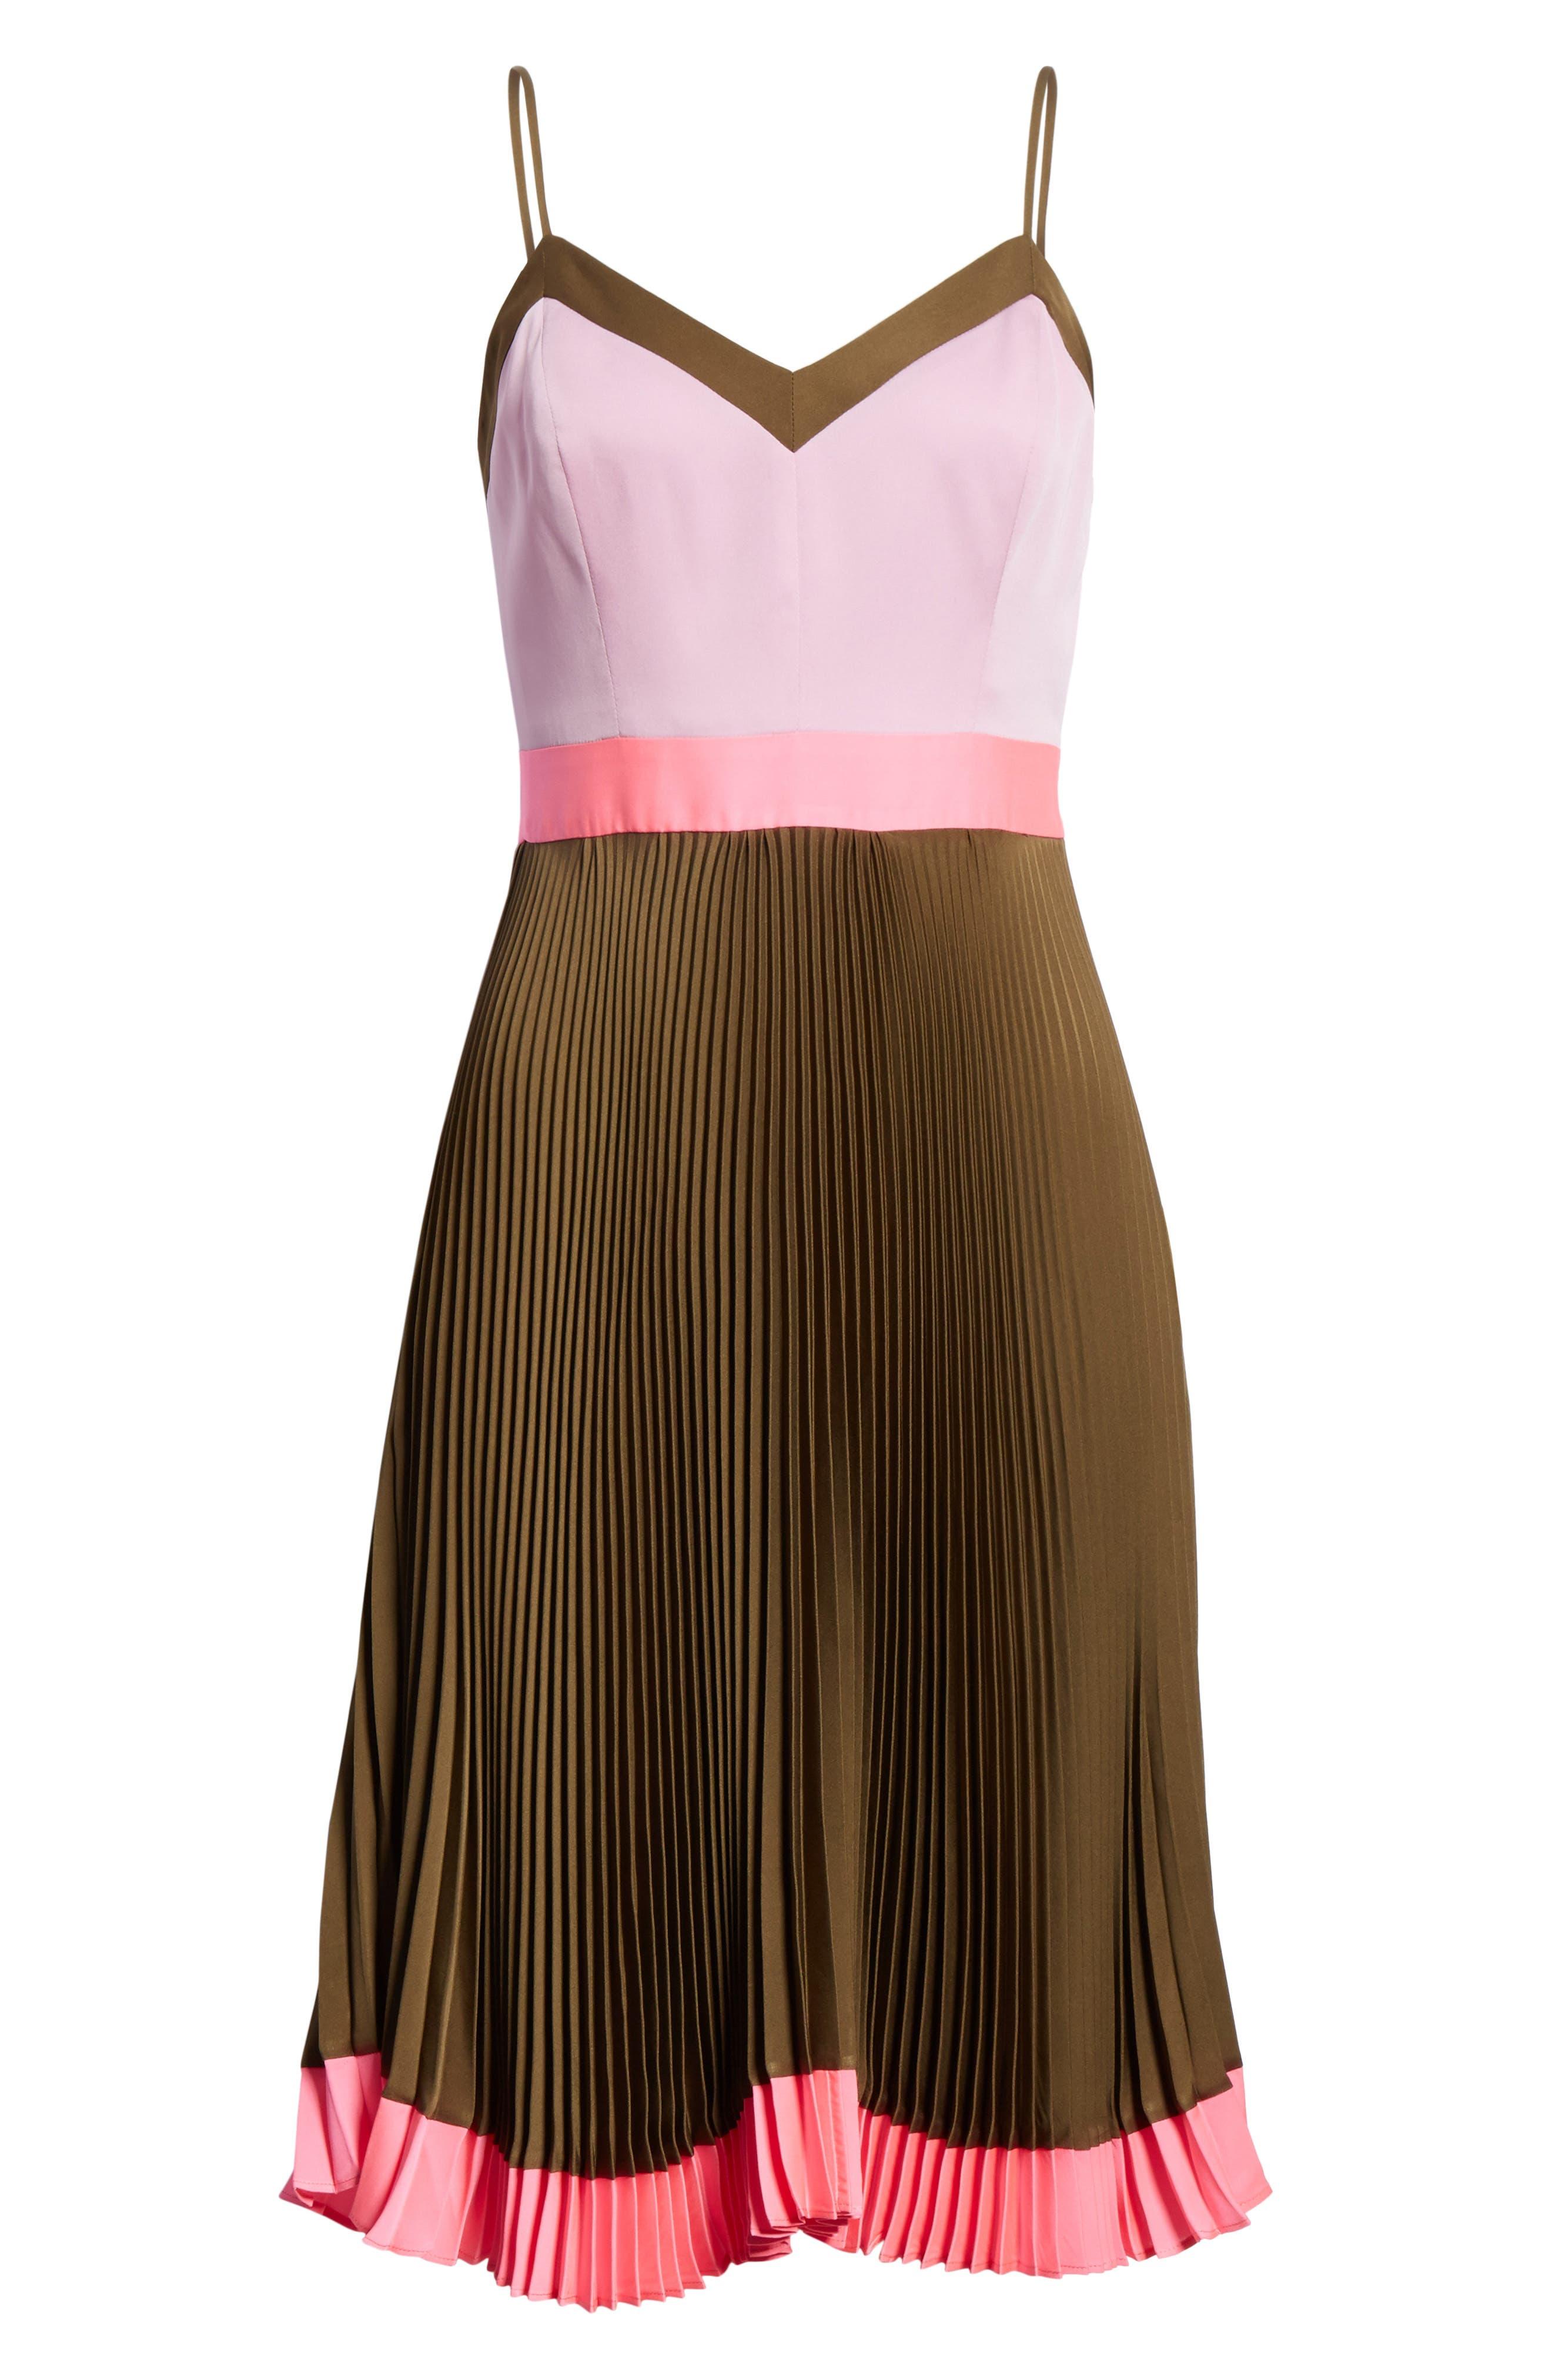 Jill Pleated Stretch Silk Dress,                             Alternate thumbnail 6, color,                             680